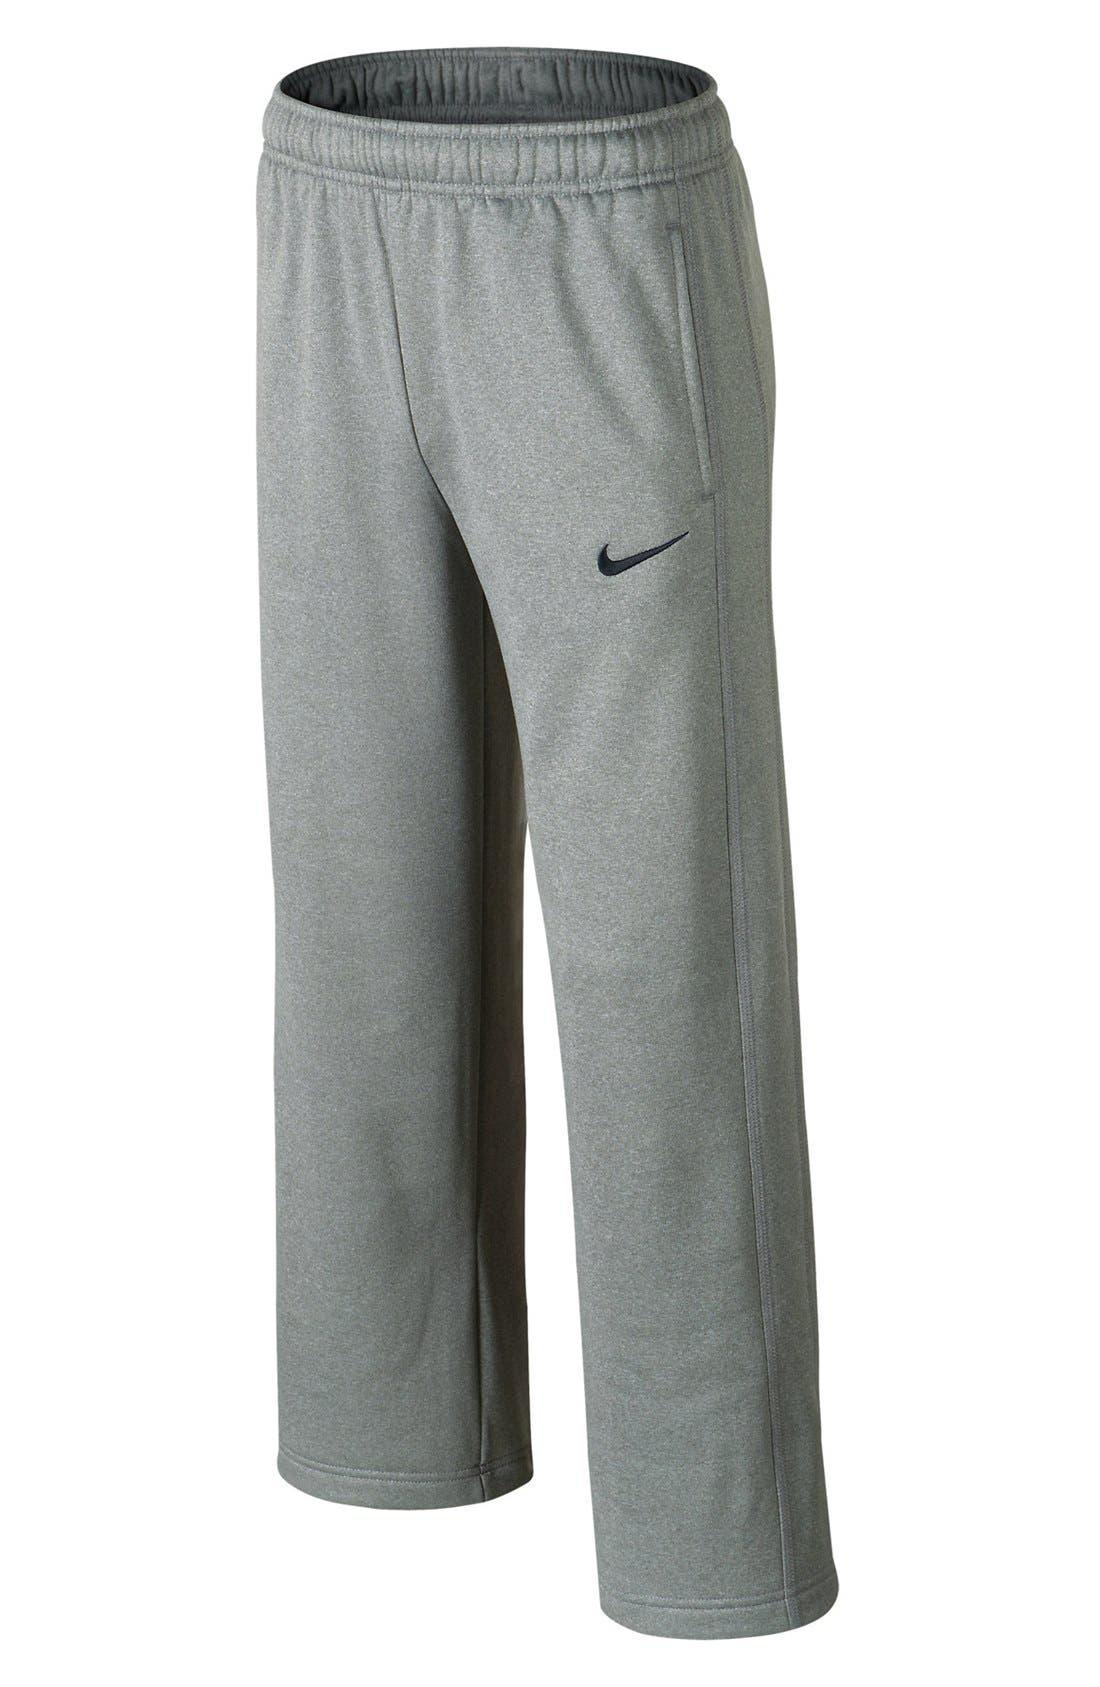 Alternate Image 1 Selected - Nike 'KO' Fleece Pants (Little Boys & Big Boys)